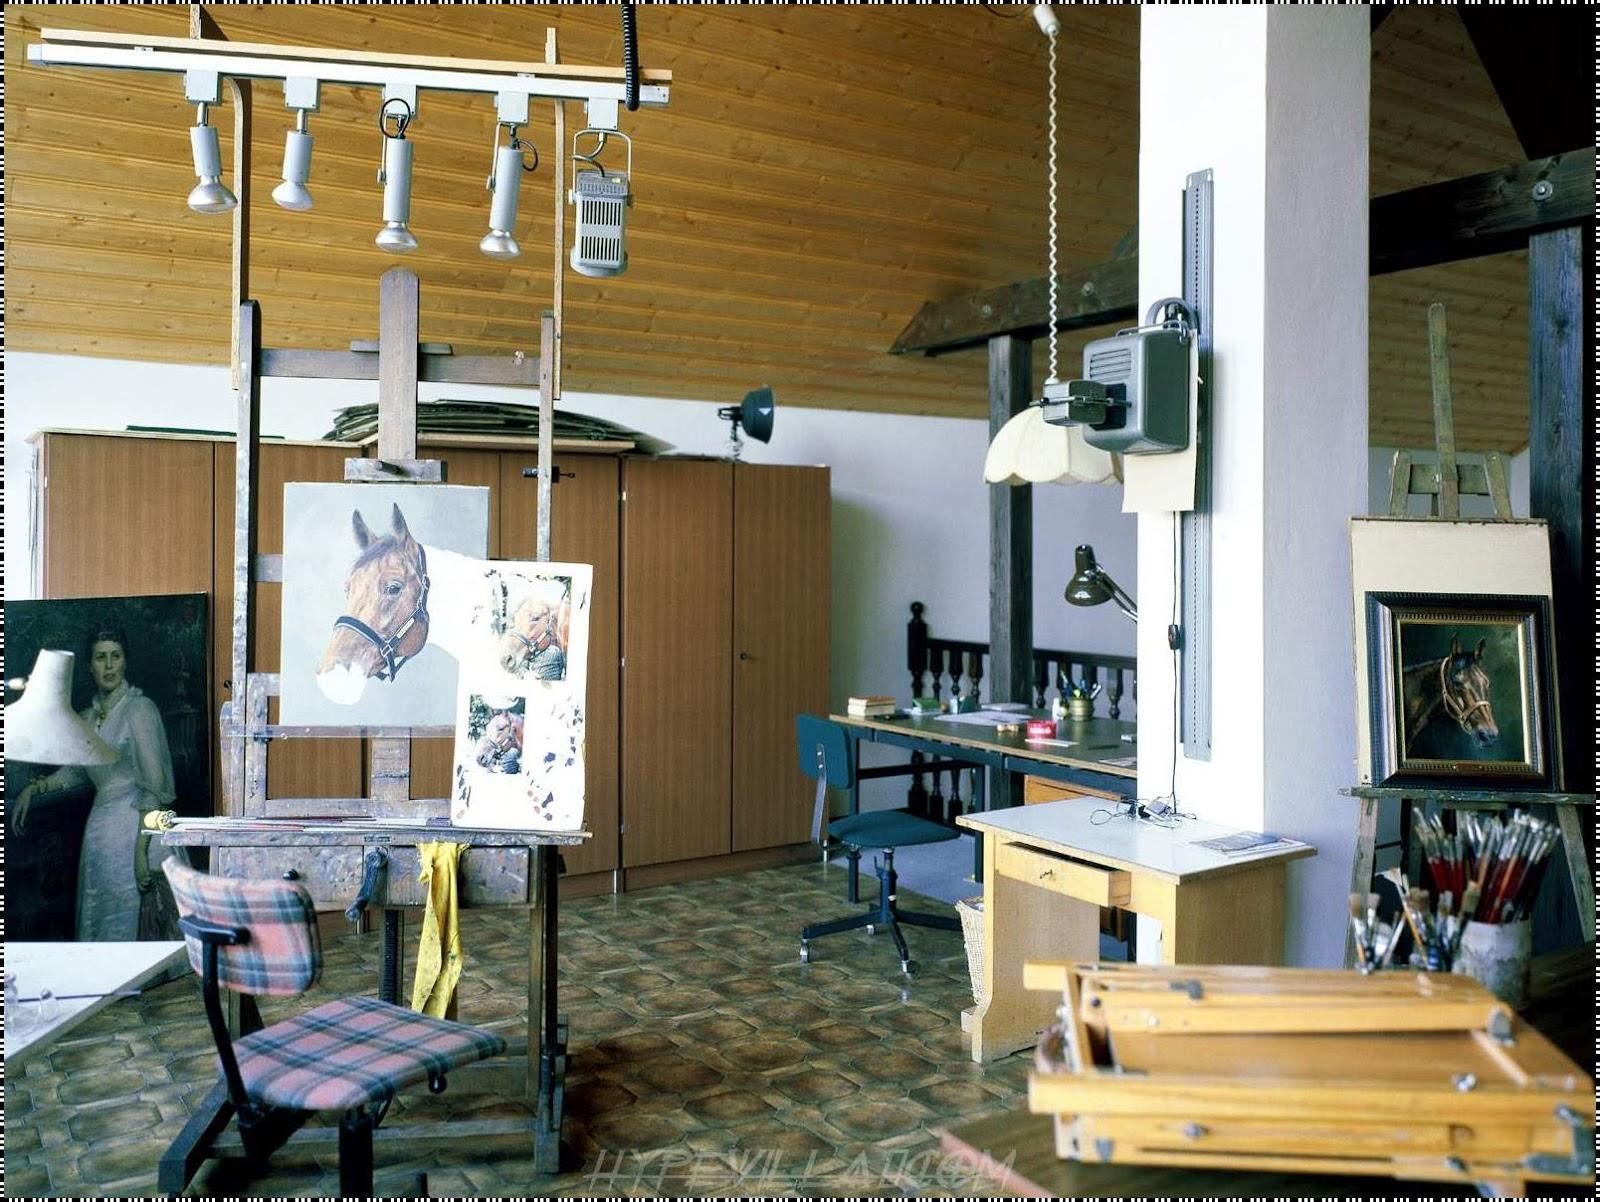 Home Design Ideas Construction: BEAUTIFUL ARTIST ROOM INTERIOR DESIGN IDEAS WITH PICTURE